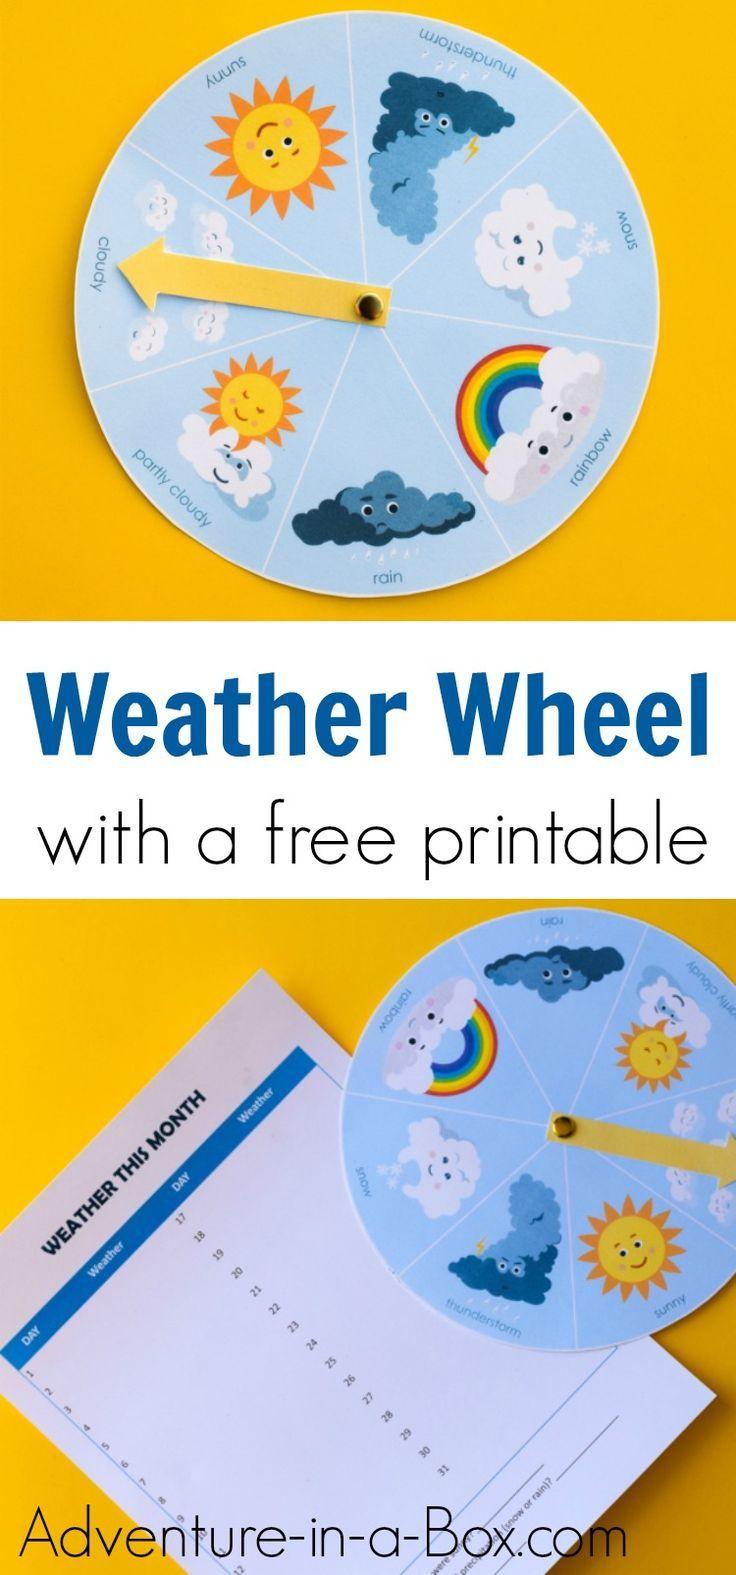 Free Printable Weather Wheel for Kids Weather activities